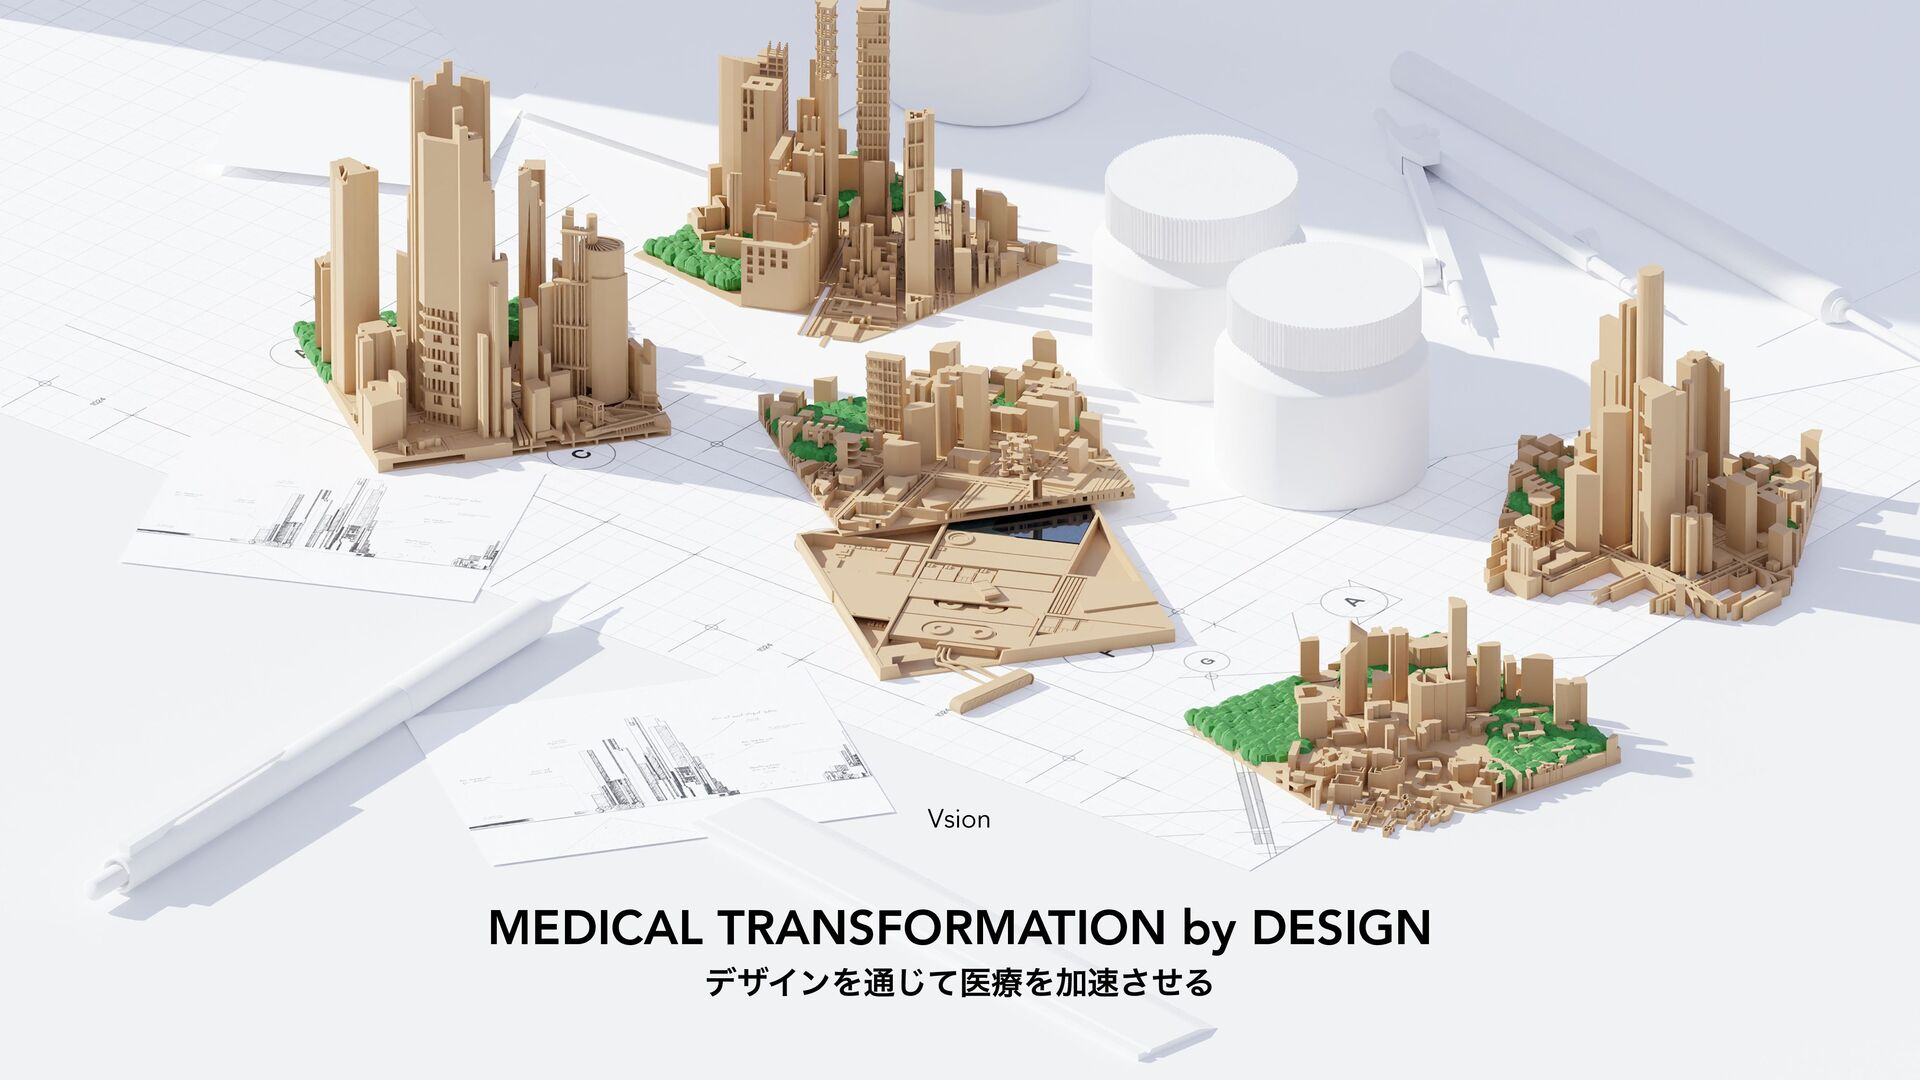 MEDICAL TRANSFORMATION by DESIGN σβΠϯΛ௨ͯ͡ҩྍΛՃ͞...